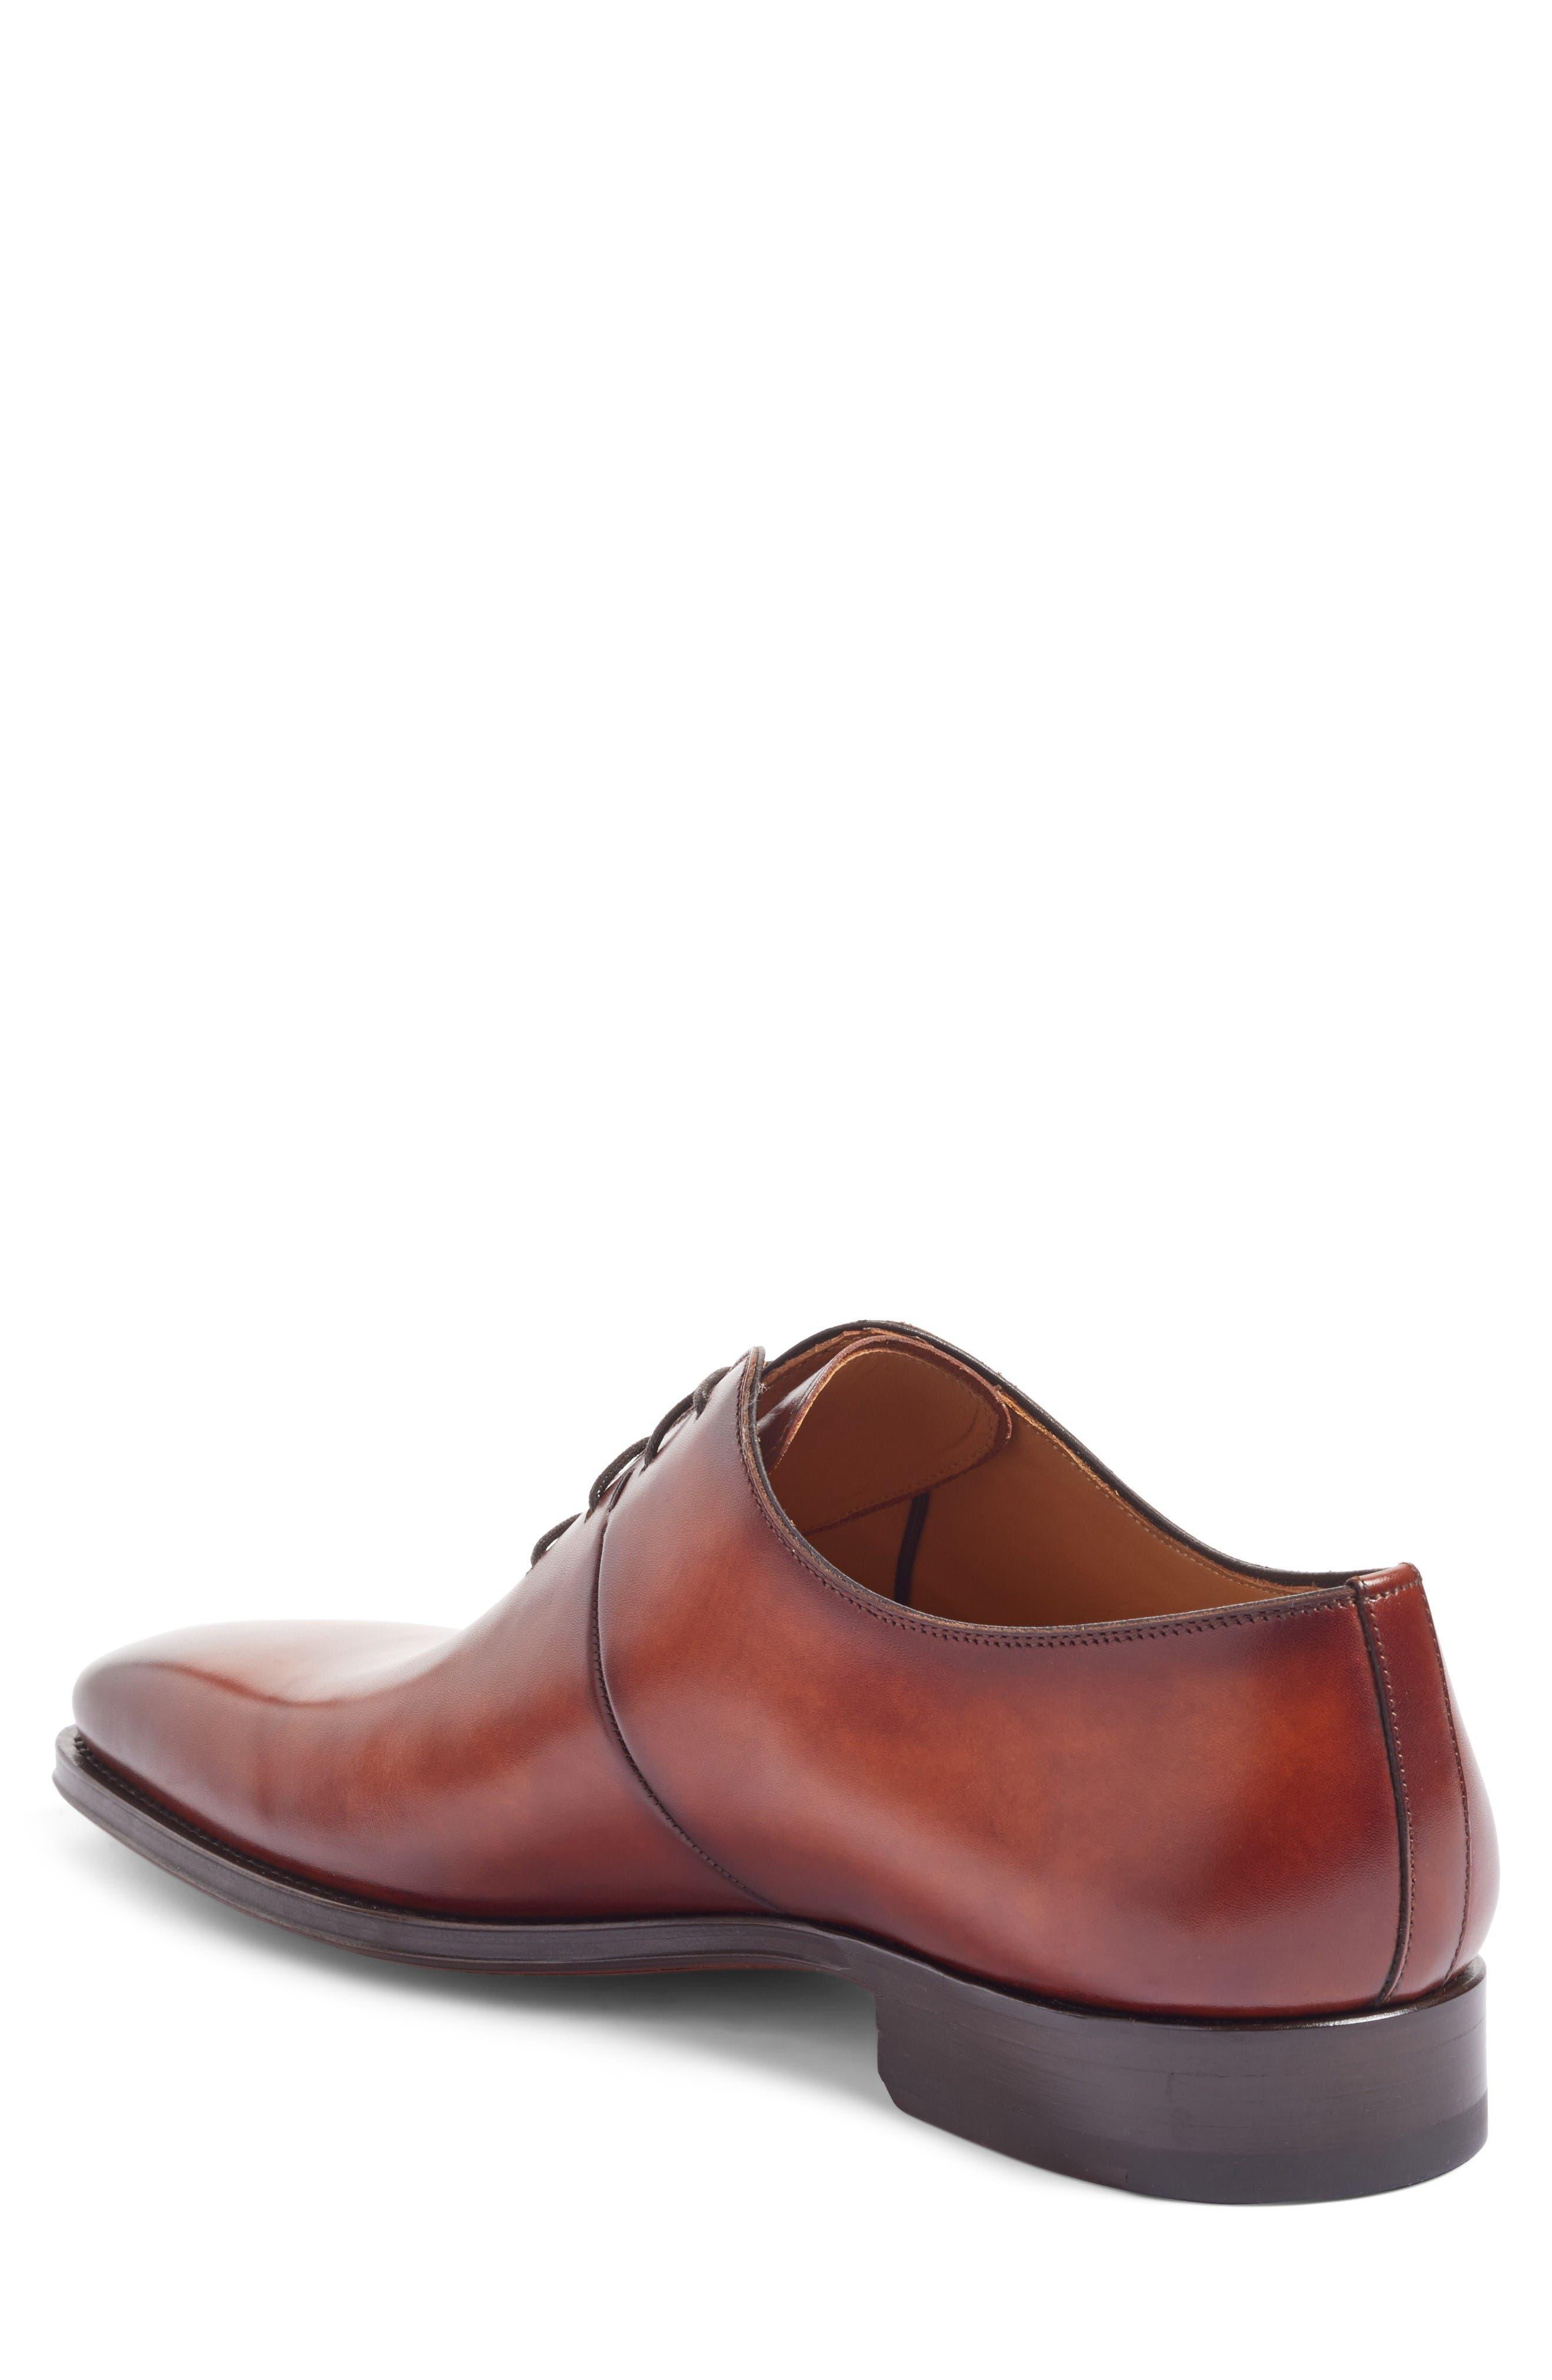 Cornado Plain Toe Oxford,                             Alternate thumbnail 2, color,                             Cognac Leather